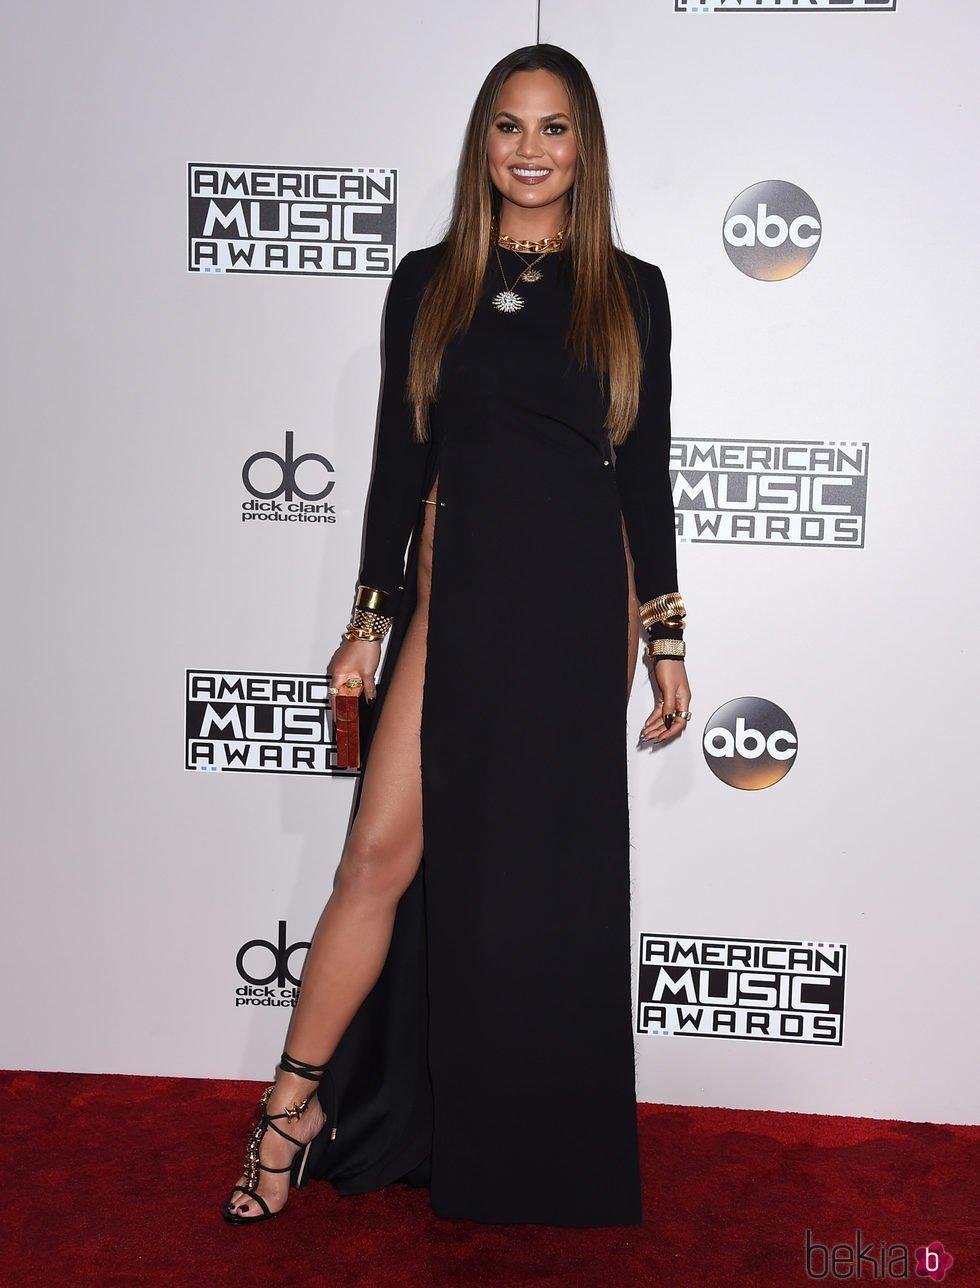 Chrissy Teigen en los American Music Awards 2016